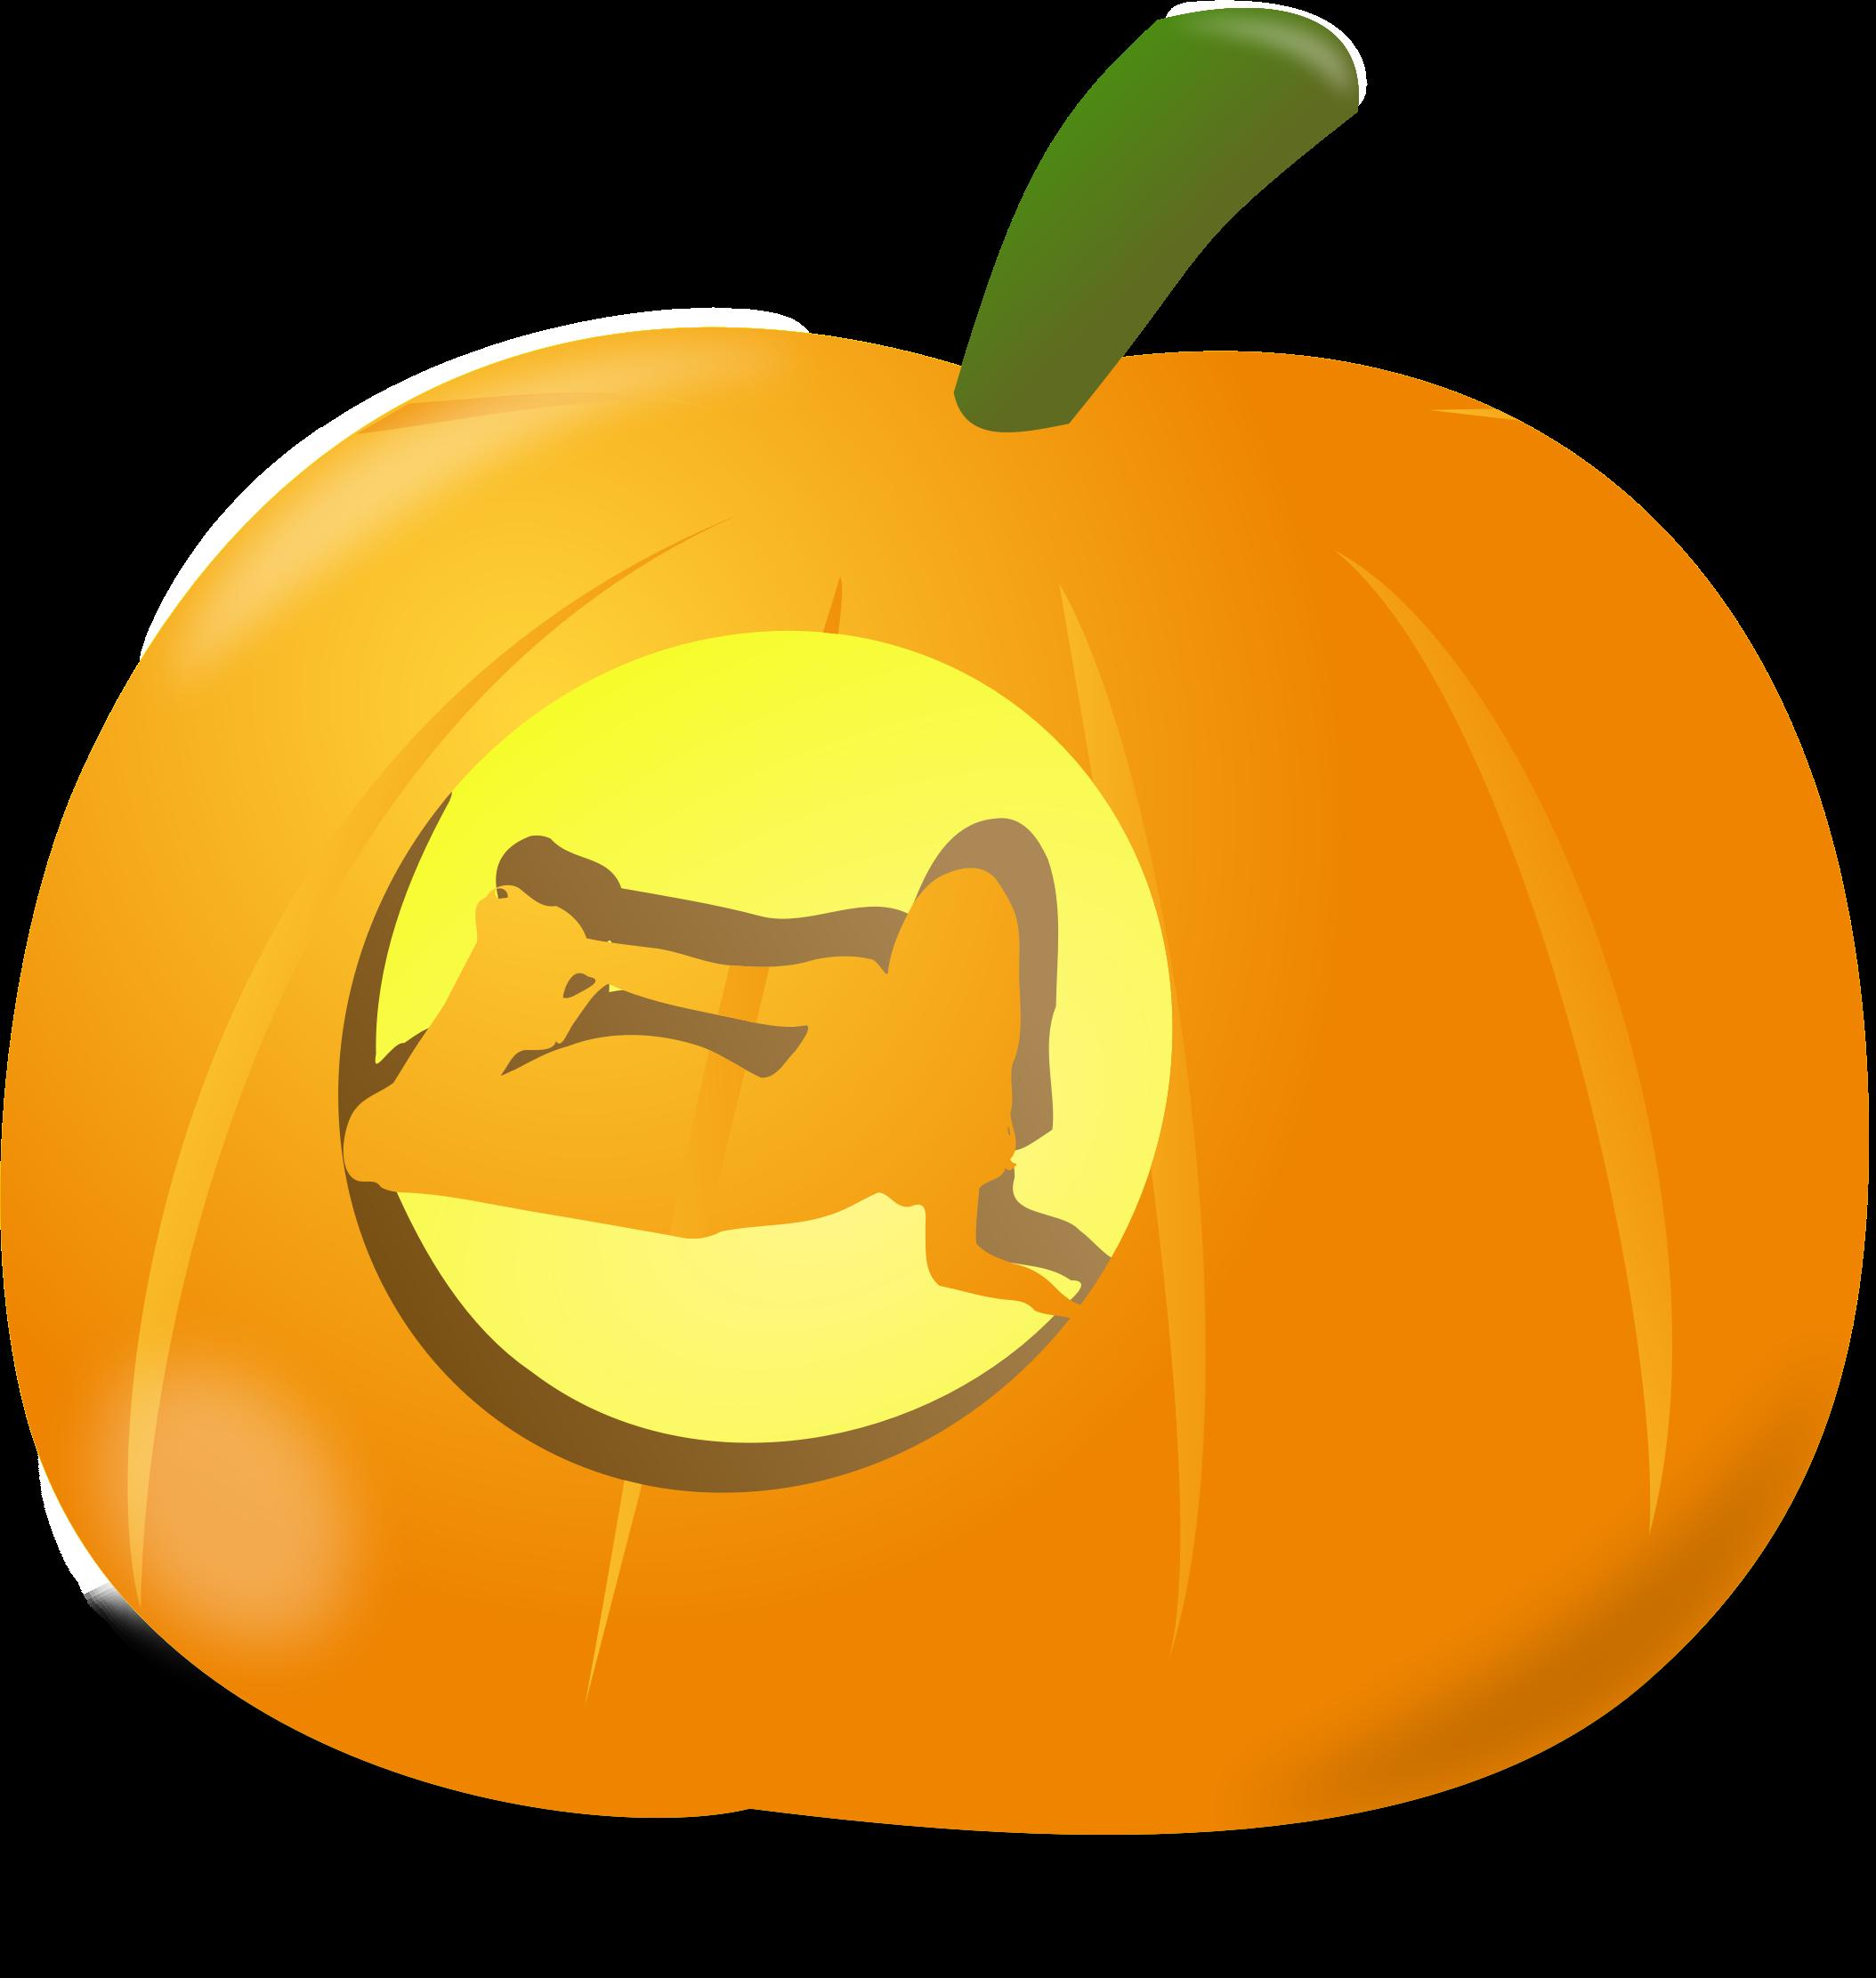 Clipart girl carving pumpkin clipart free download Clipart - Girl pumpkin clipart free download